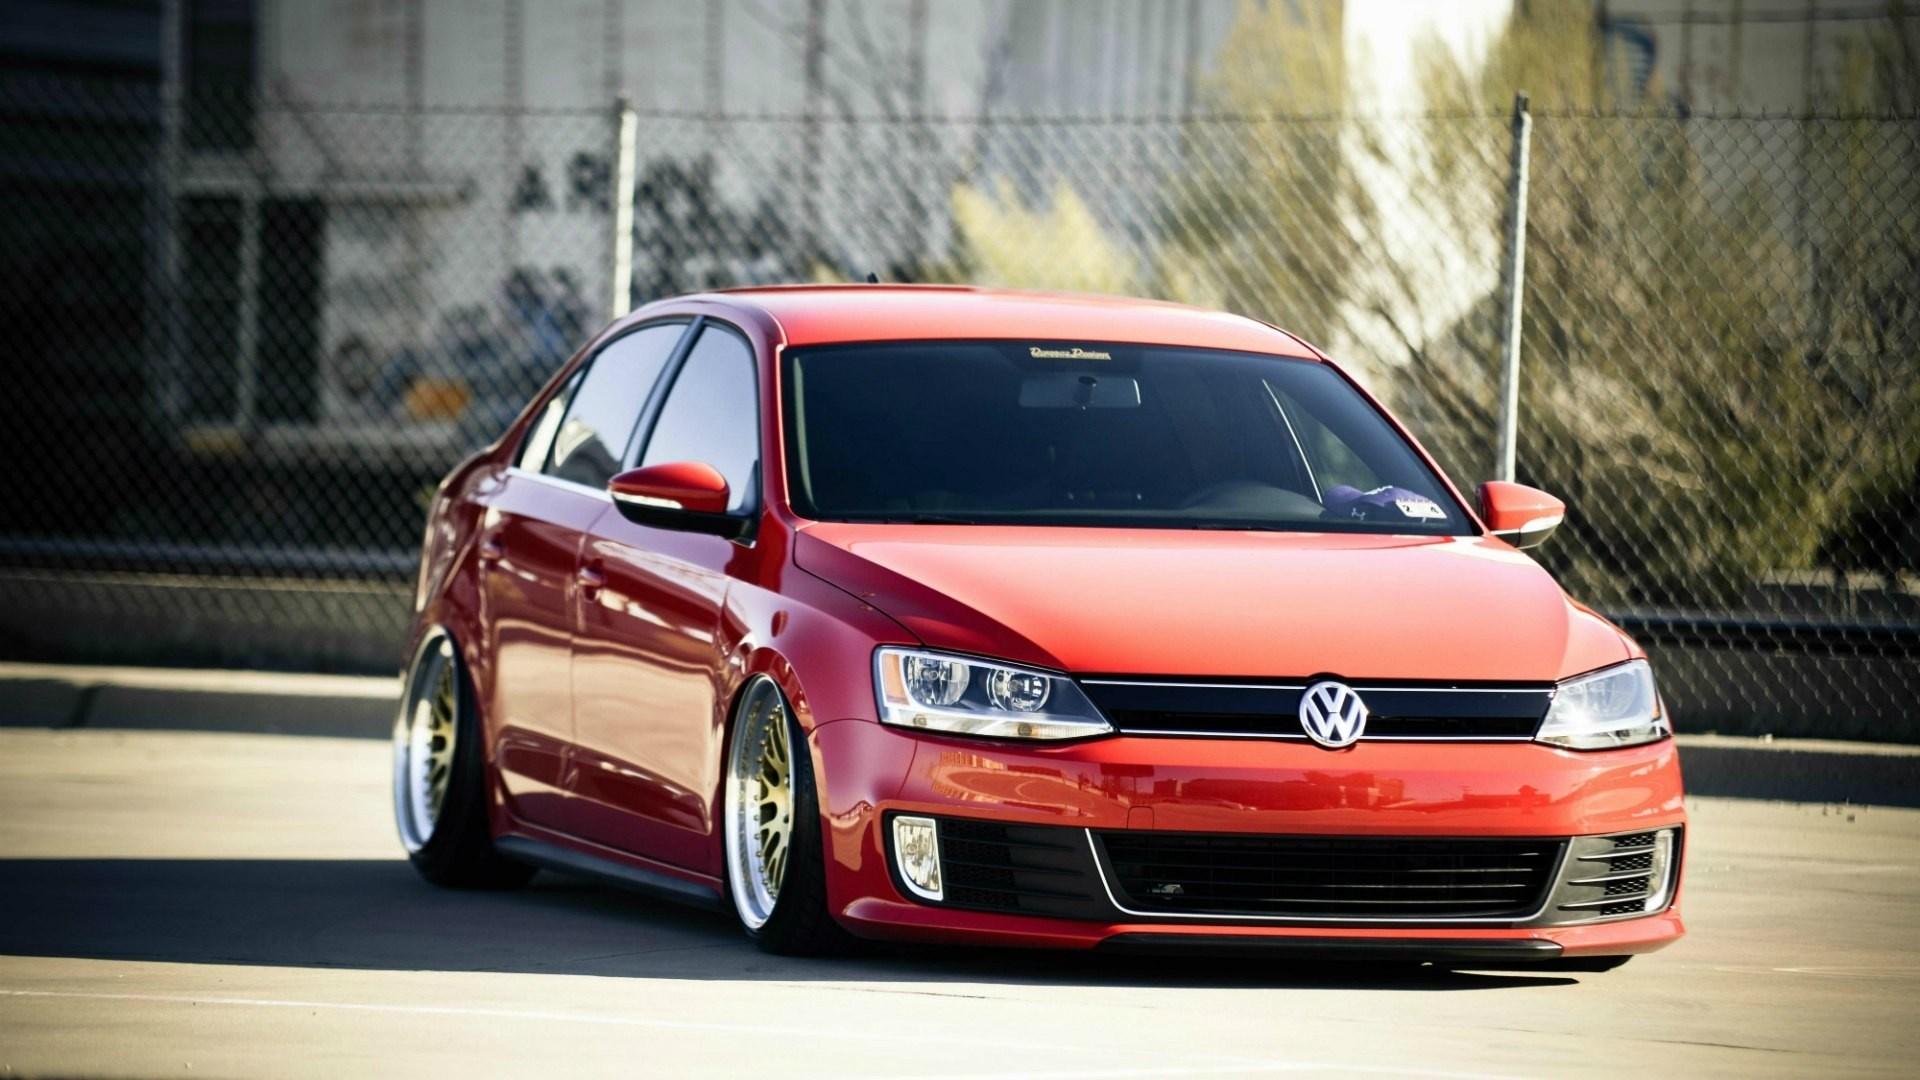 Volkswagen Jetta GLI Tuning